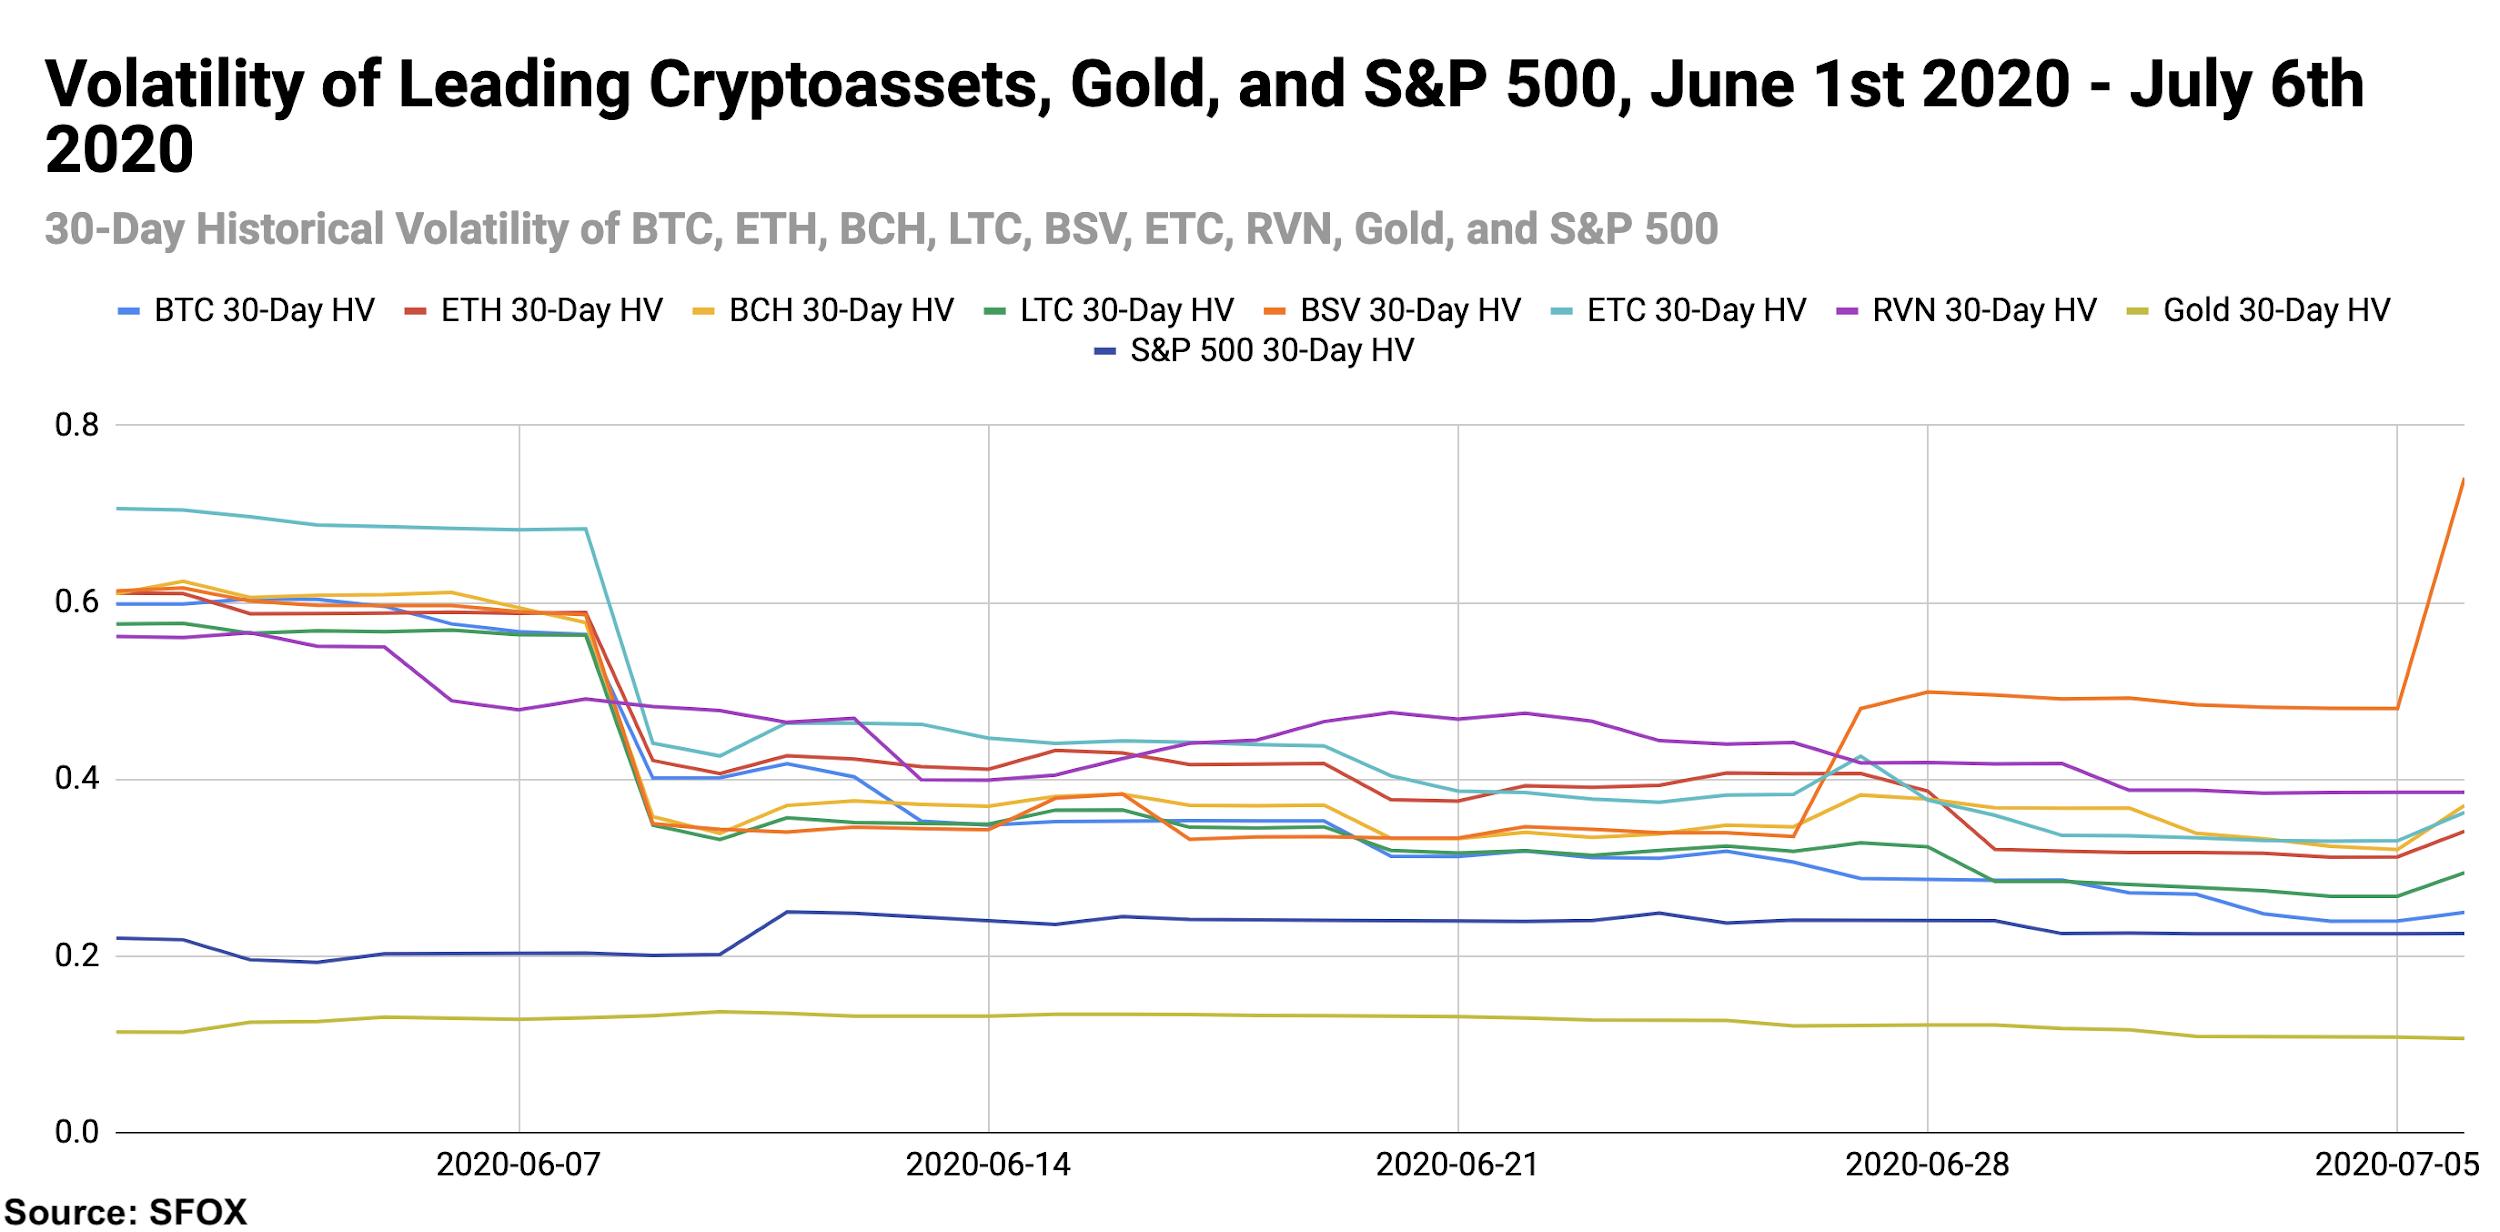 Bitcoin crypto S&P 500 gold volatility levels, July 2020.